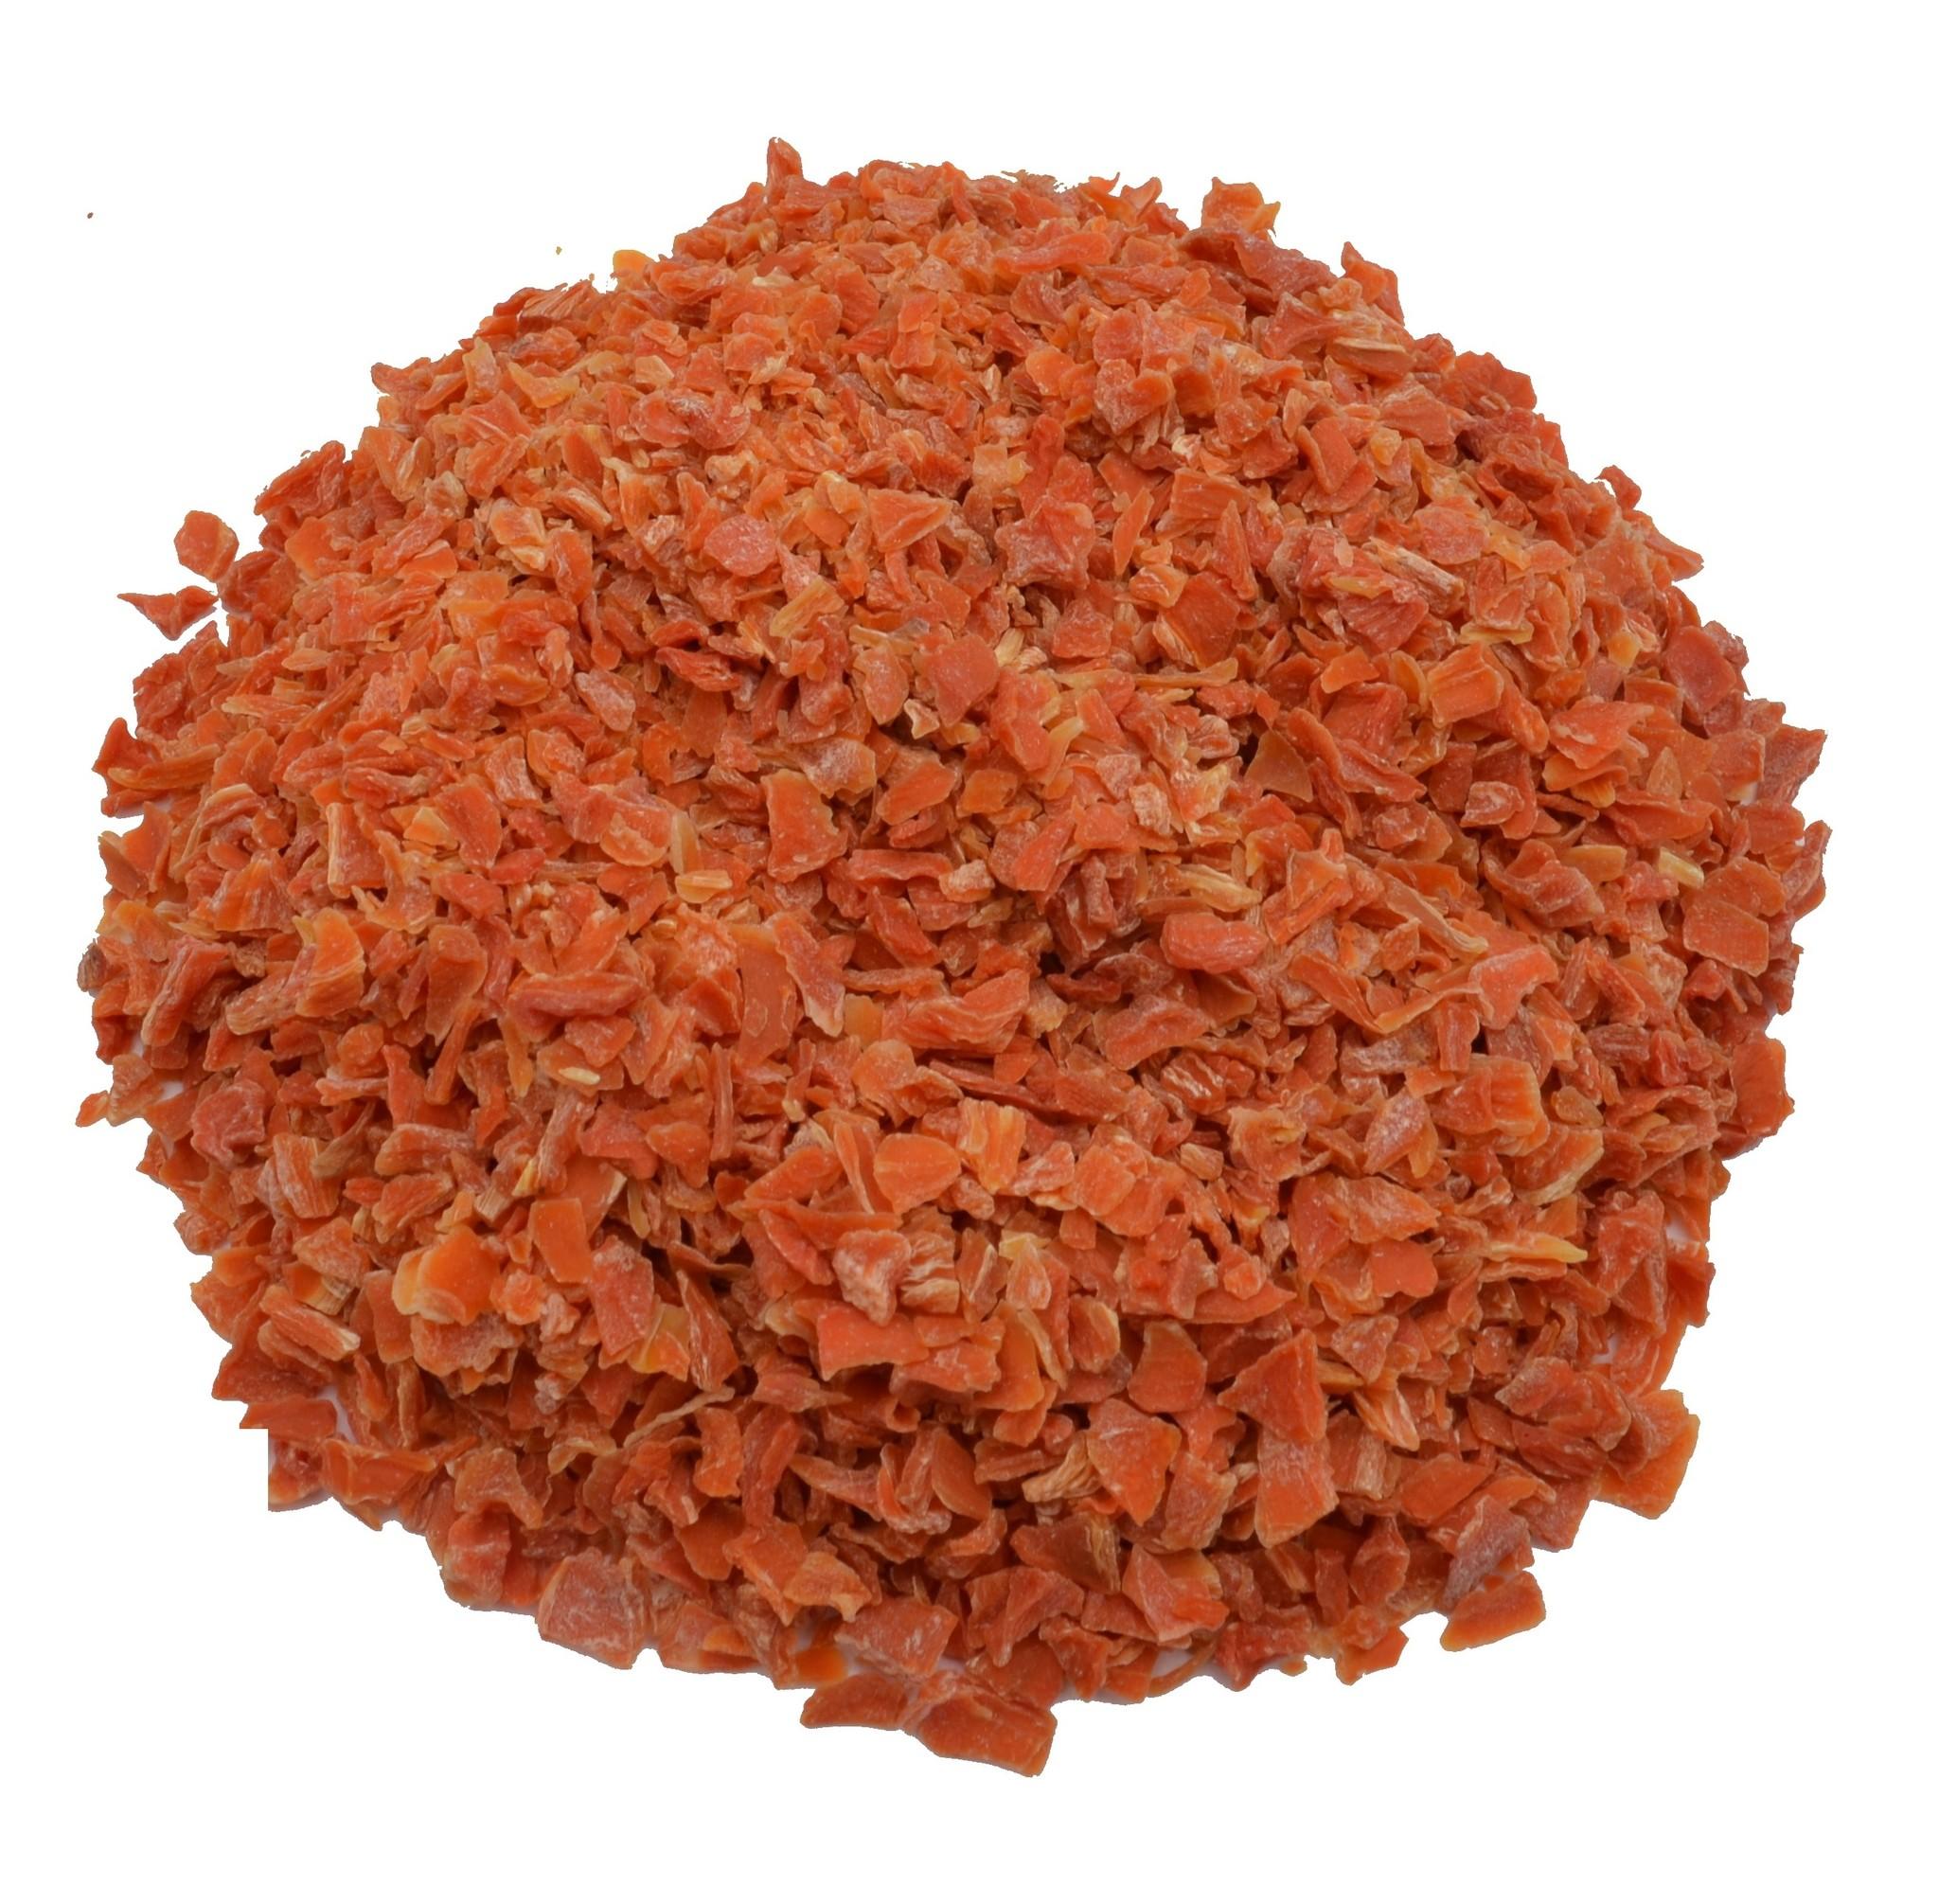 Wortel granulaat 3-4 mm